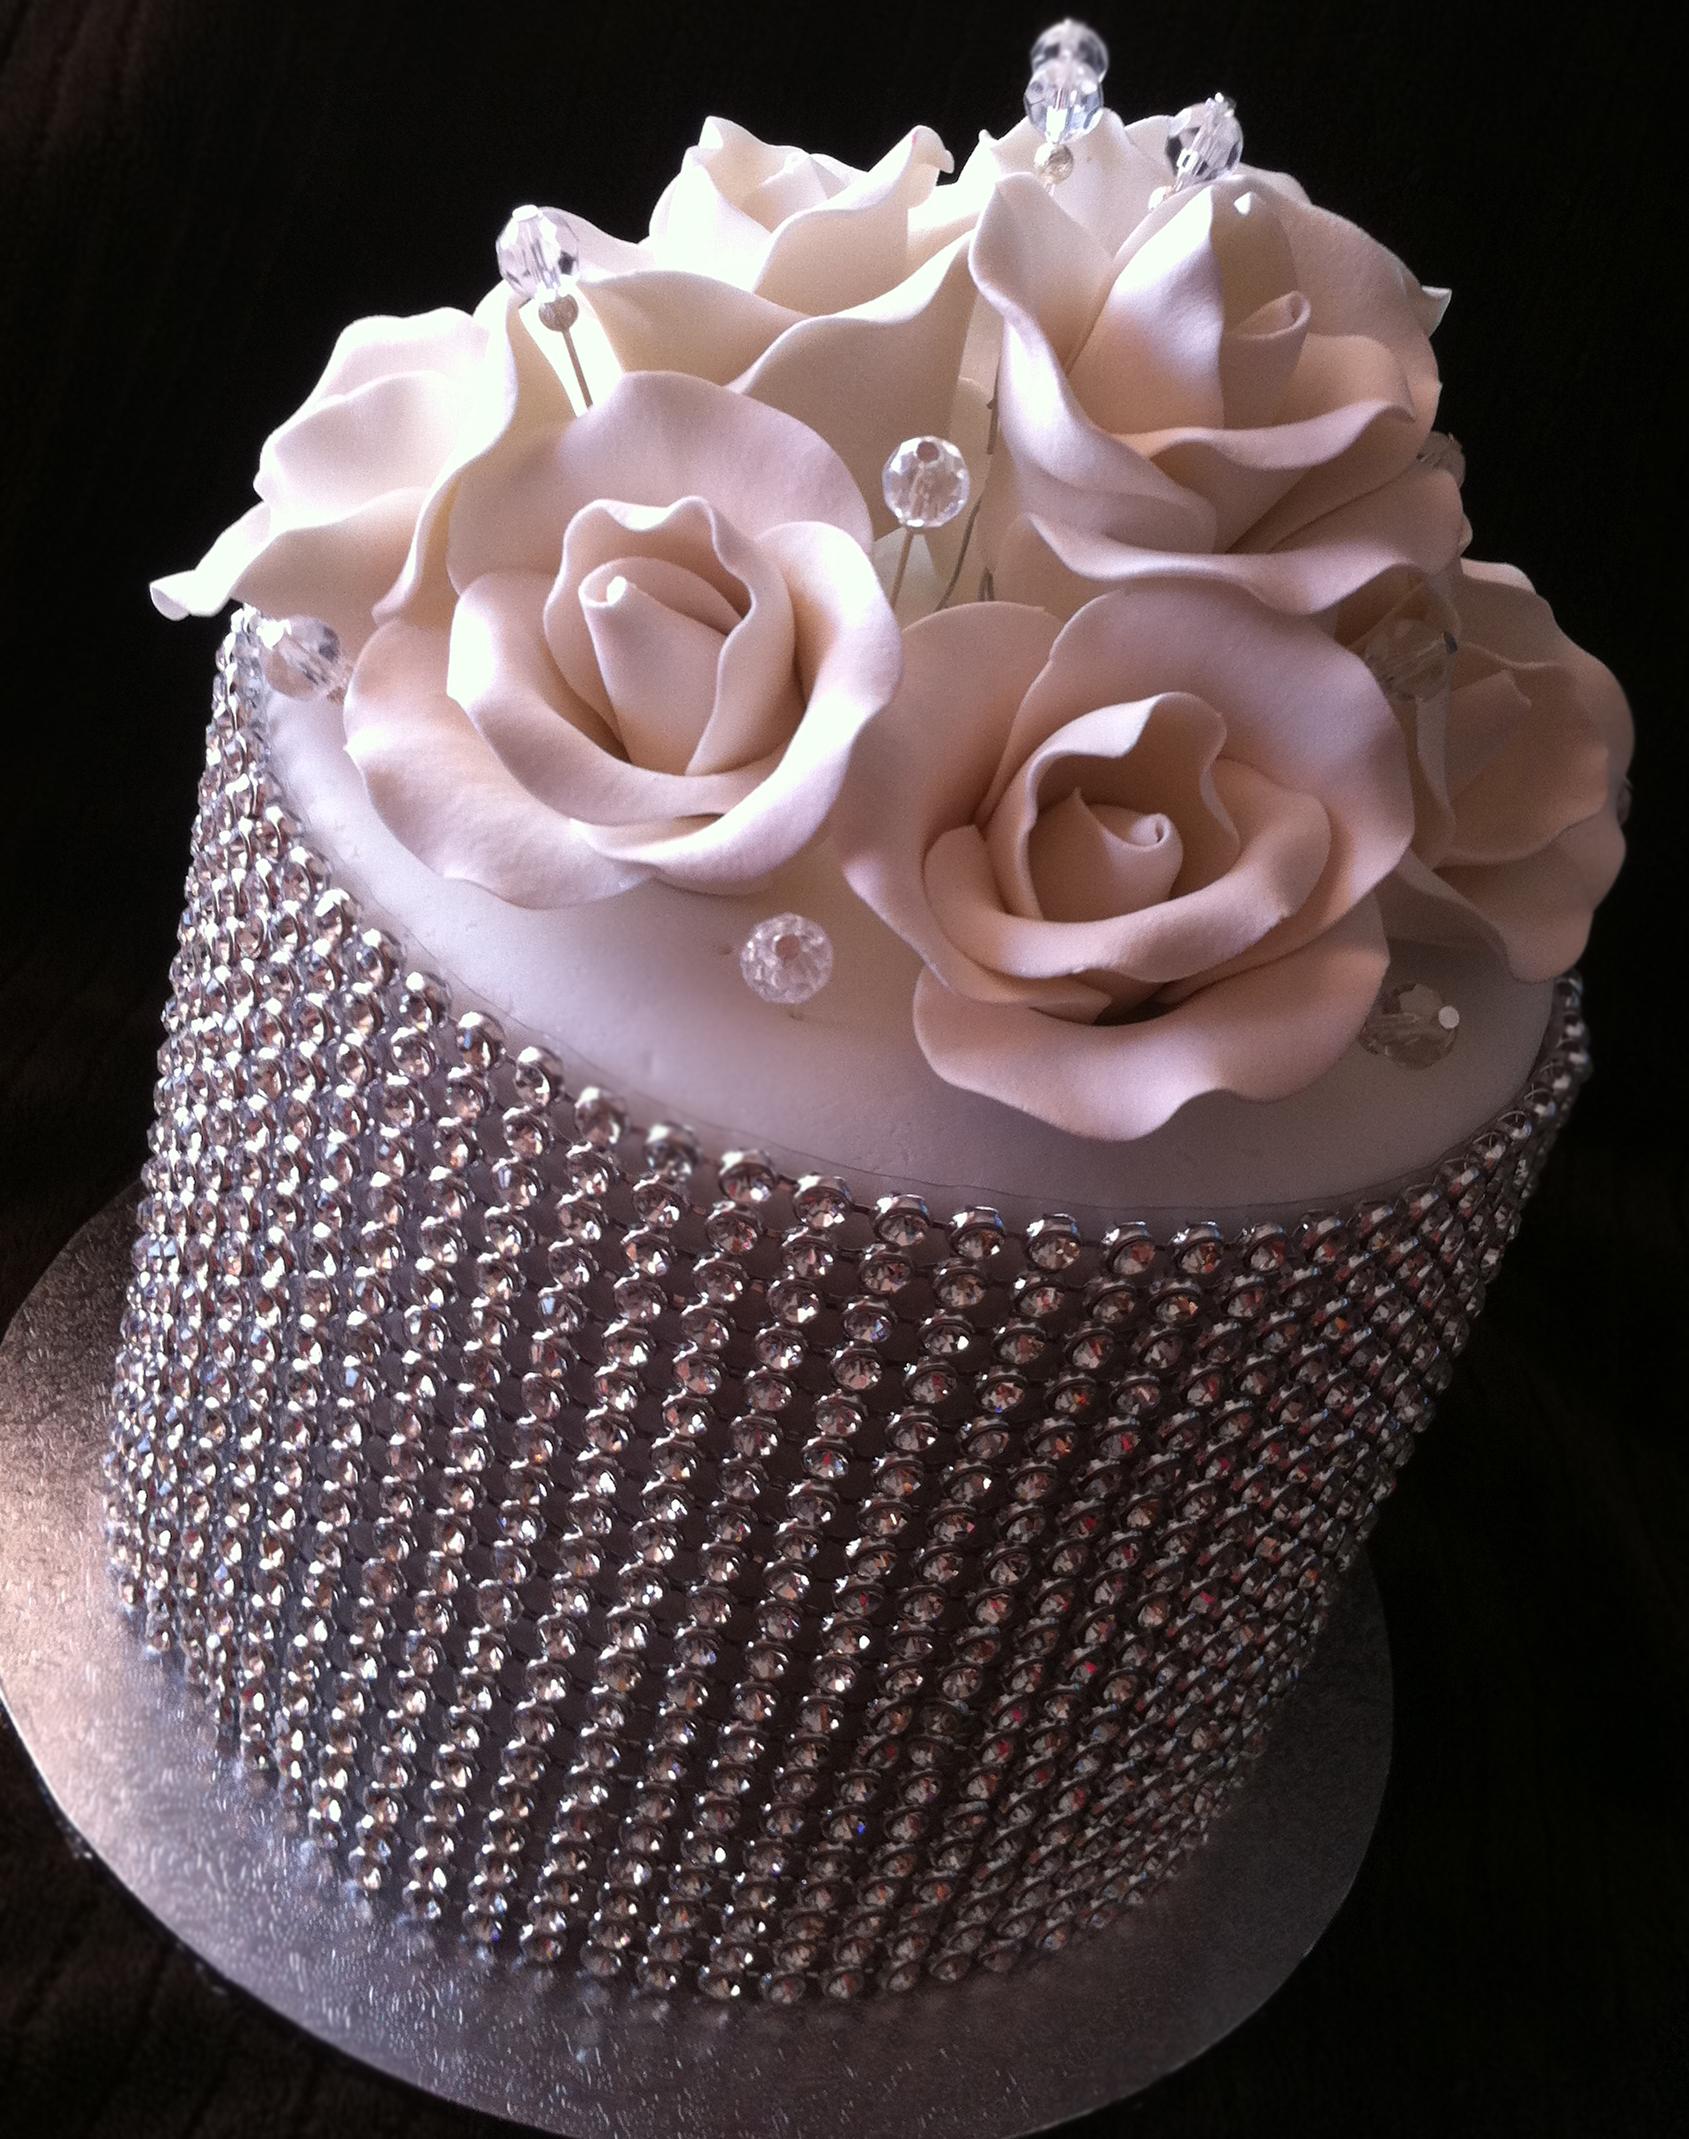 8 Tiered Cake Cakes Ideas 1 Photo 3 Tier Buttercream Wedding Cake